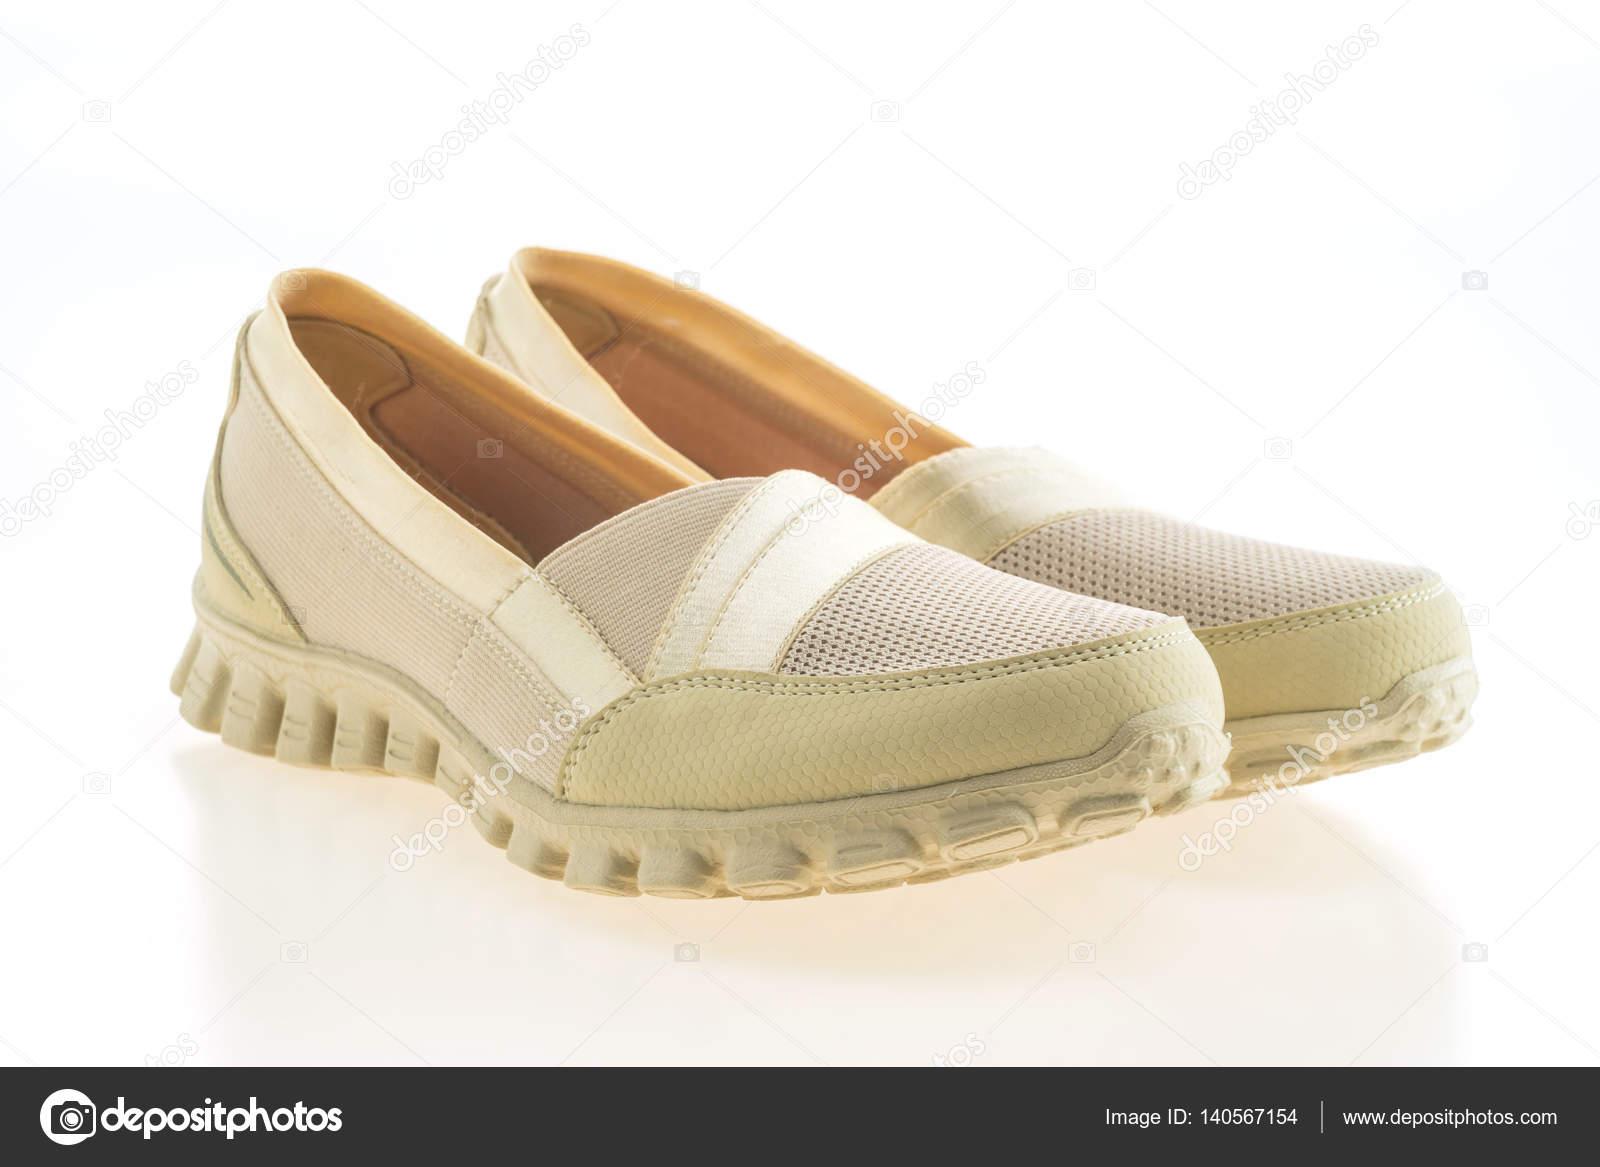 af6316bfb51 Αθλητικά παπούτσια γυναικών μόδας για απομονωμένα σε λευκό φόντο — Εικόνα  από mrsiraphol| ...